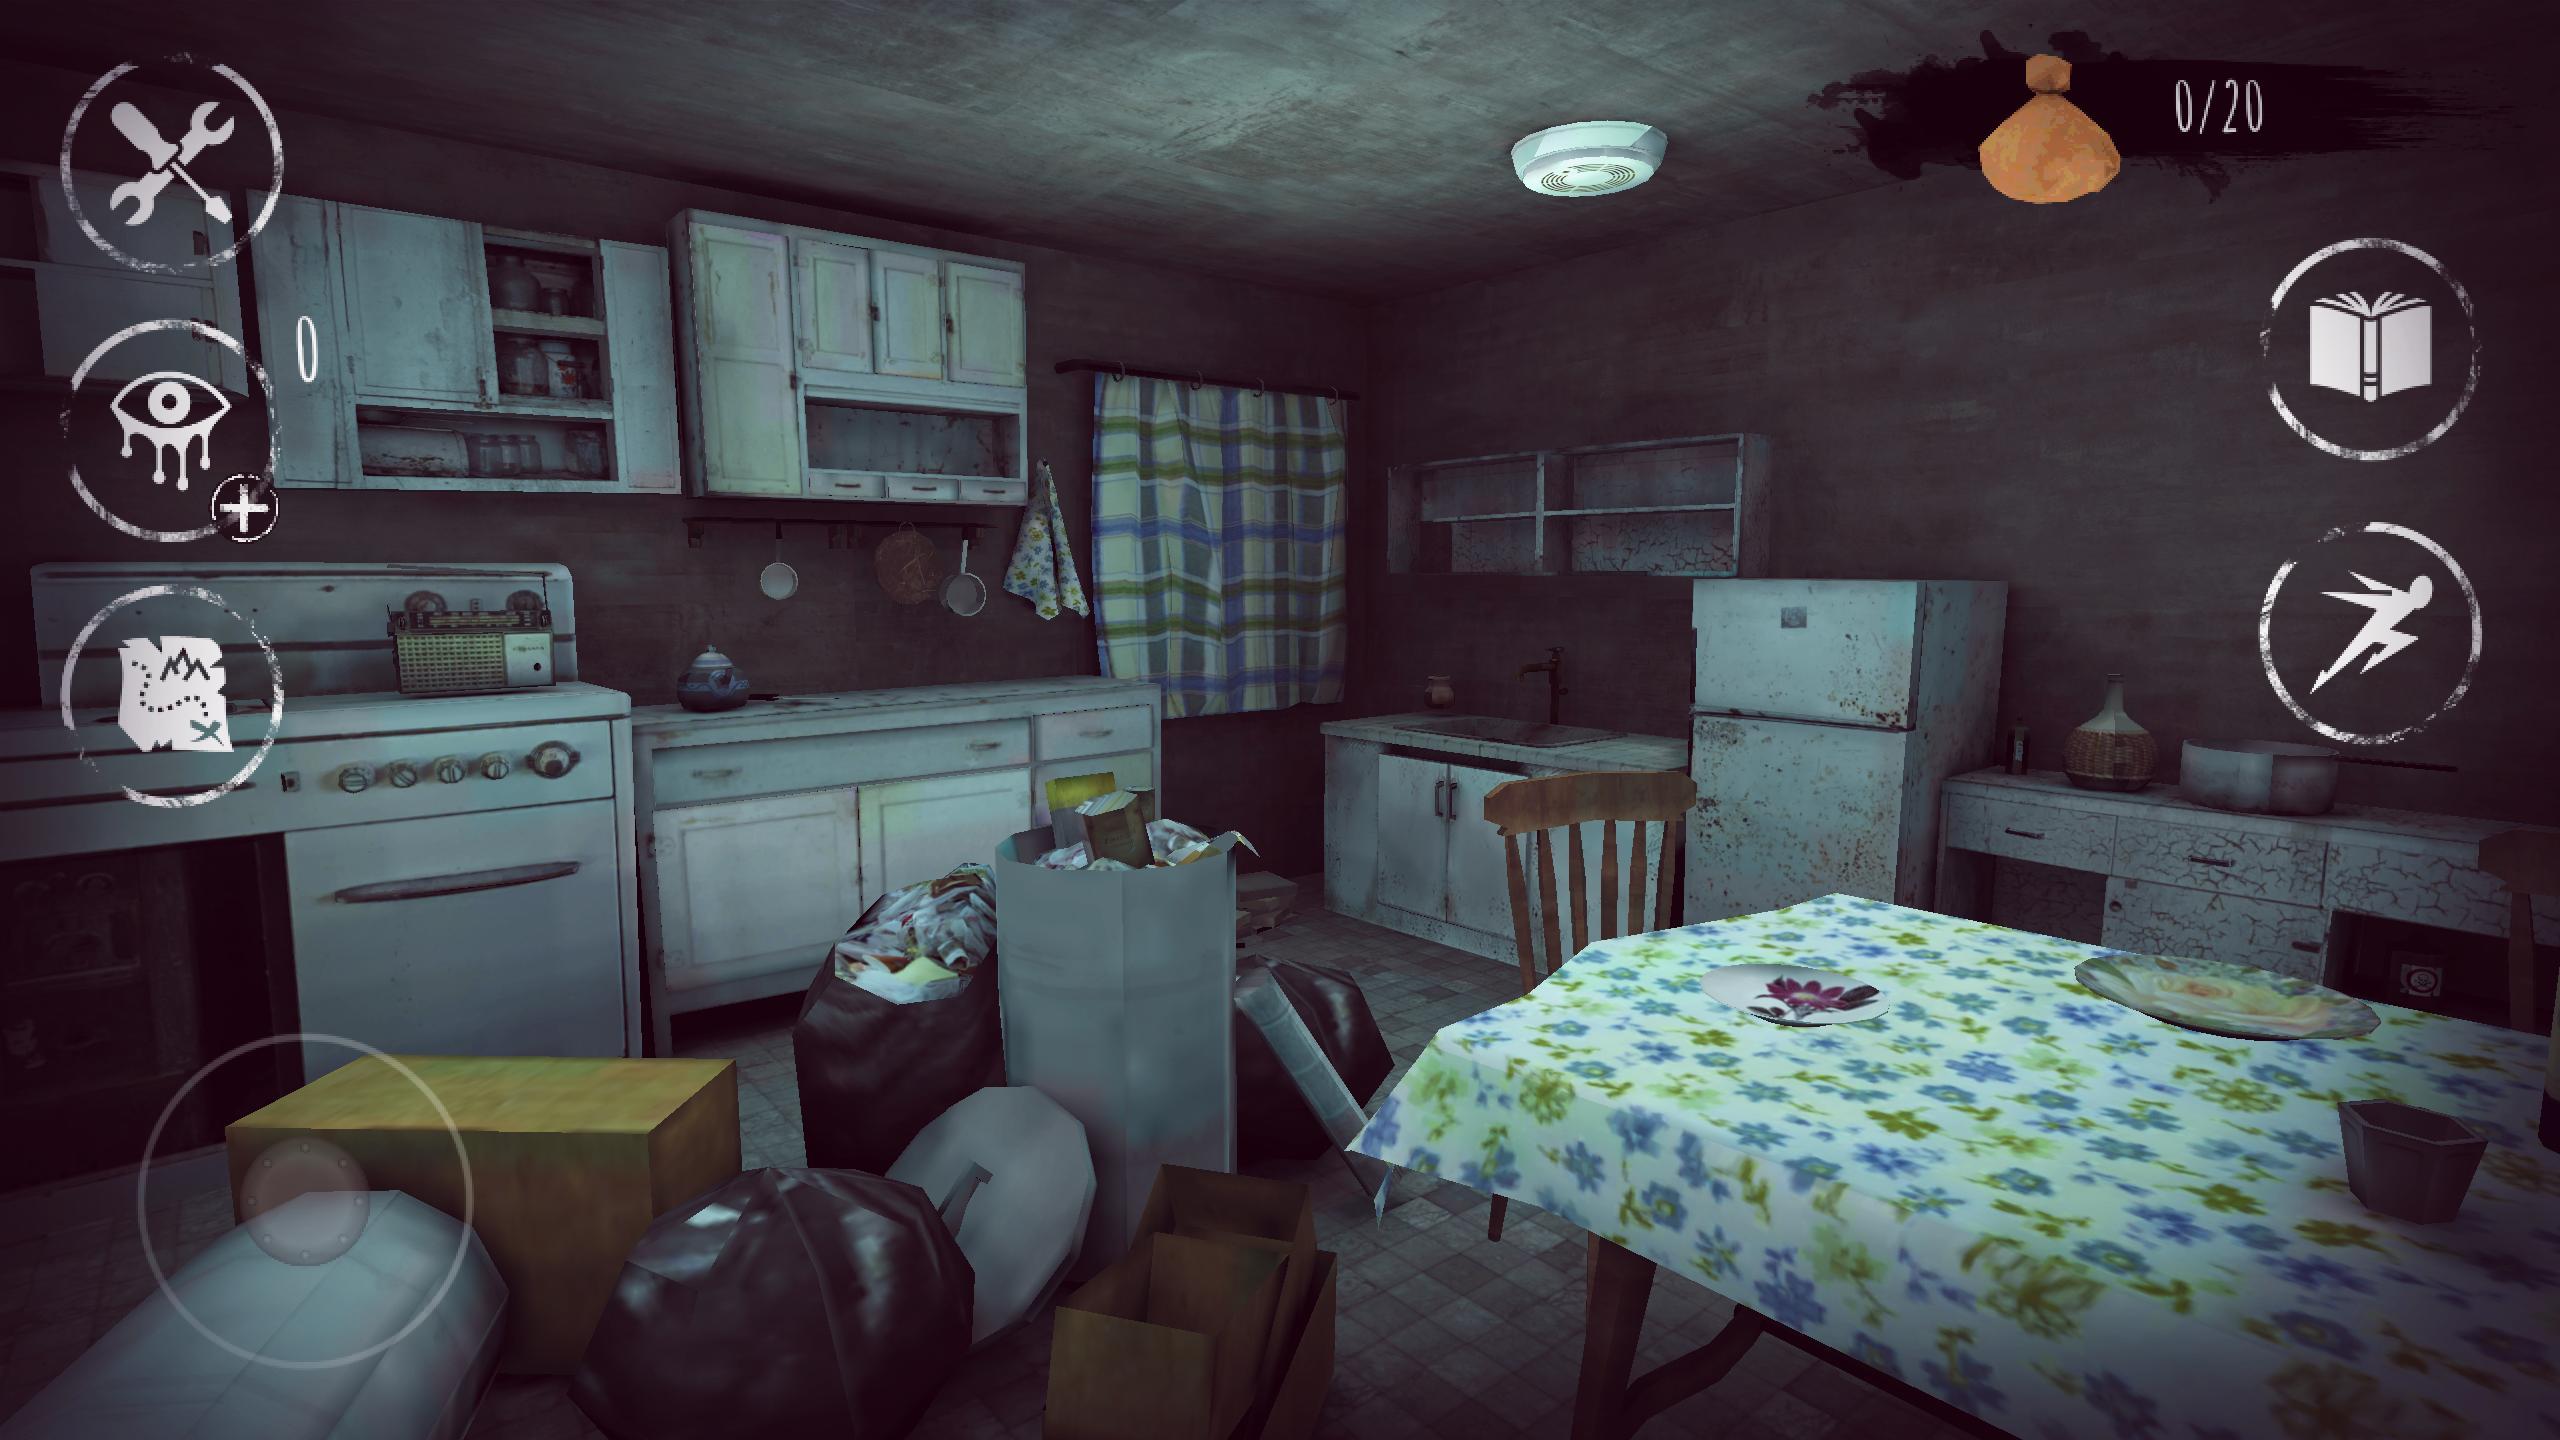 Eyes: Scary Thriller - Creepy Horror Game 6.1.21 Screenshot 3